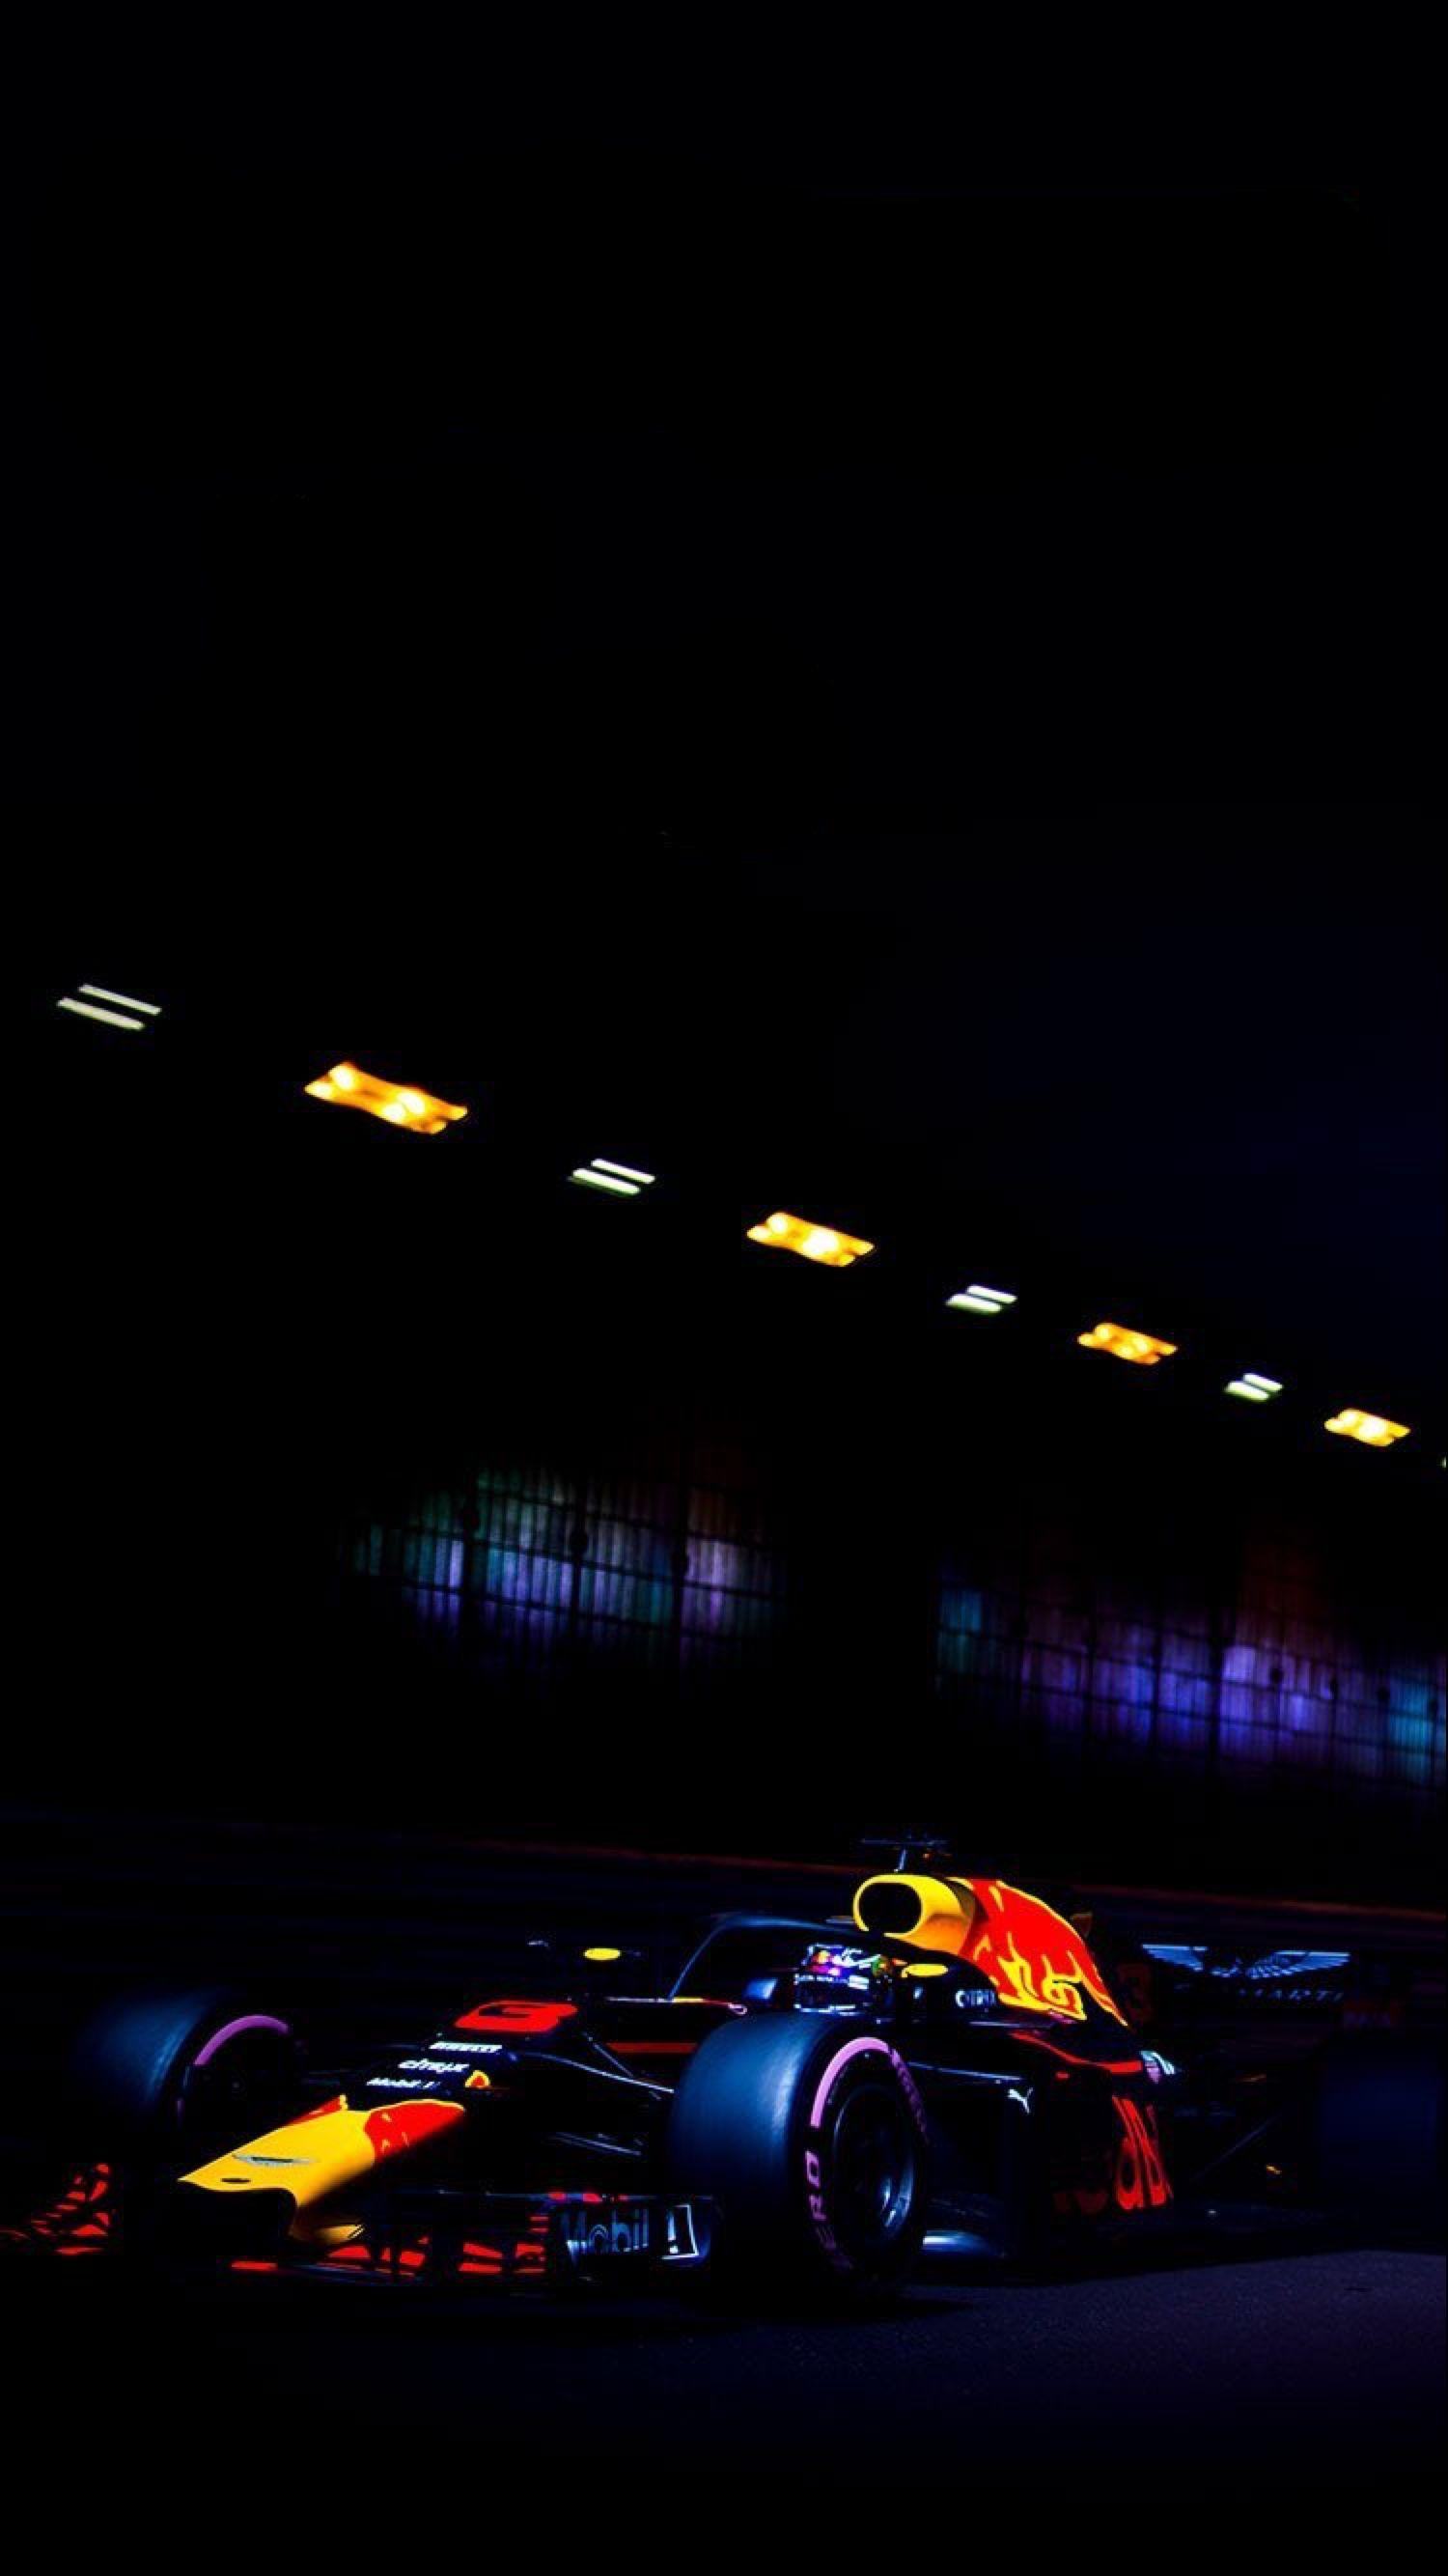 Pin By Mia Bramston On Cars Super Luxury Cars Formula 1 Car Red Car